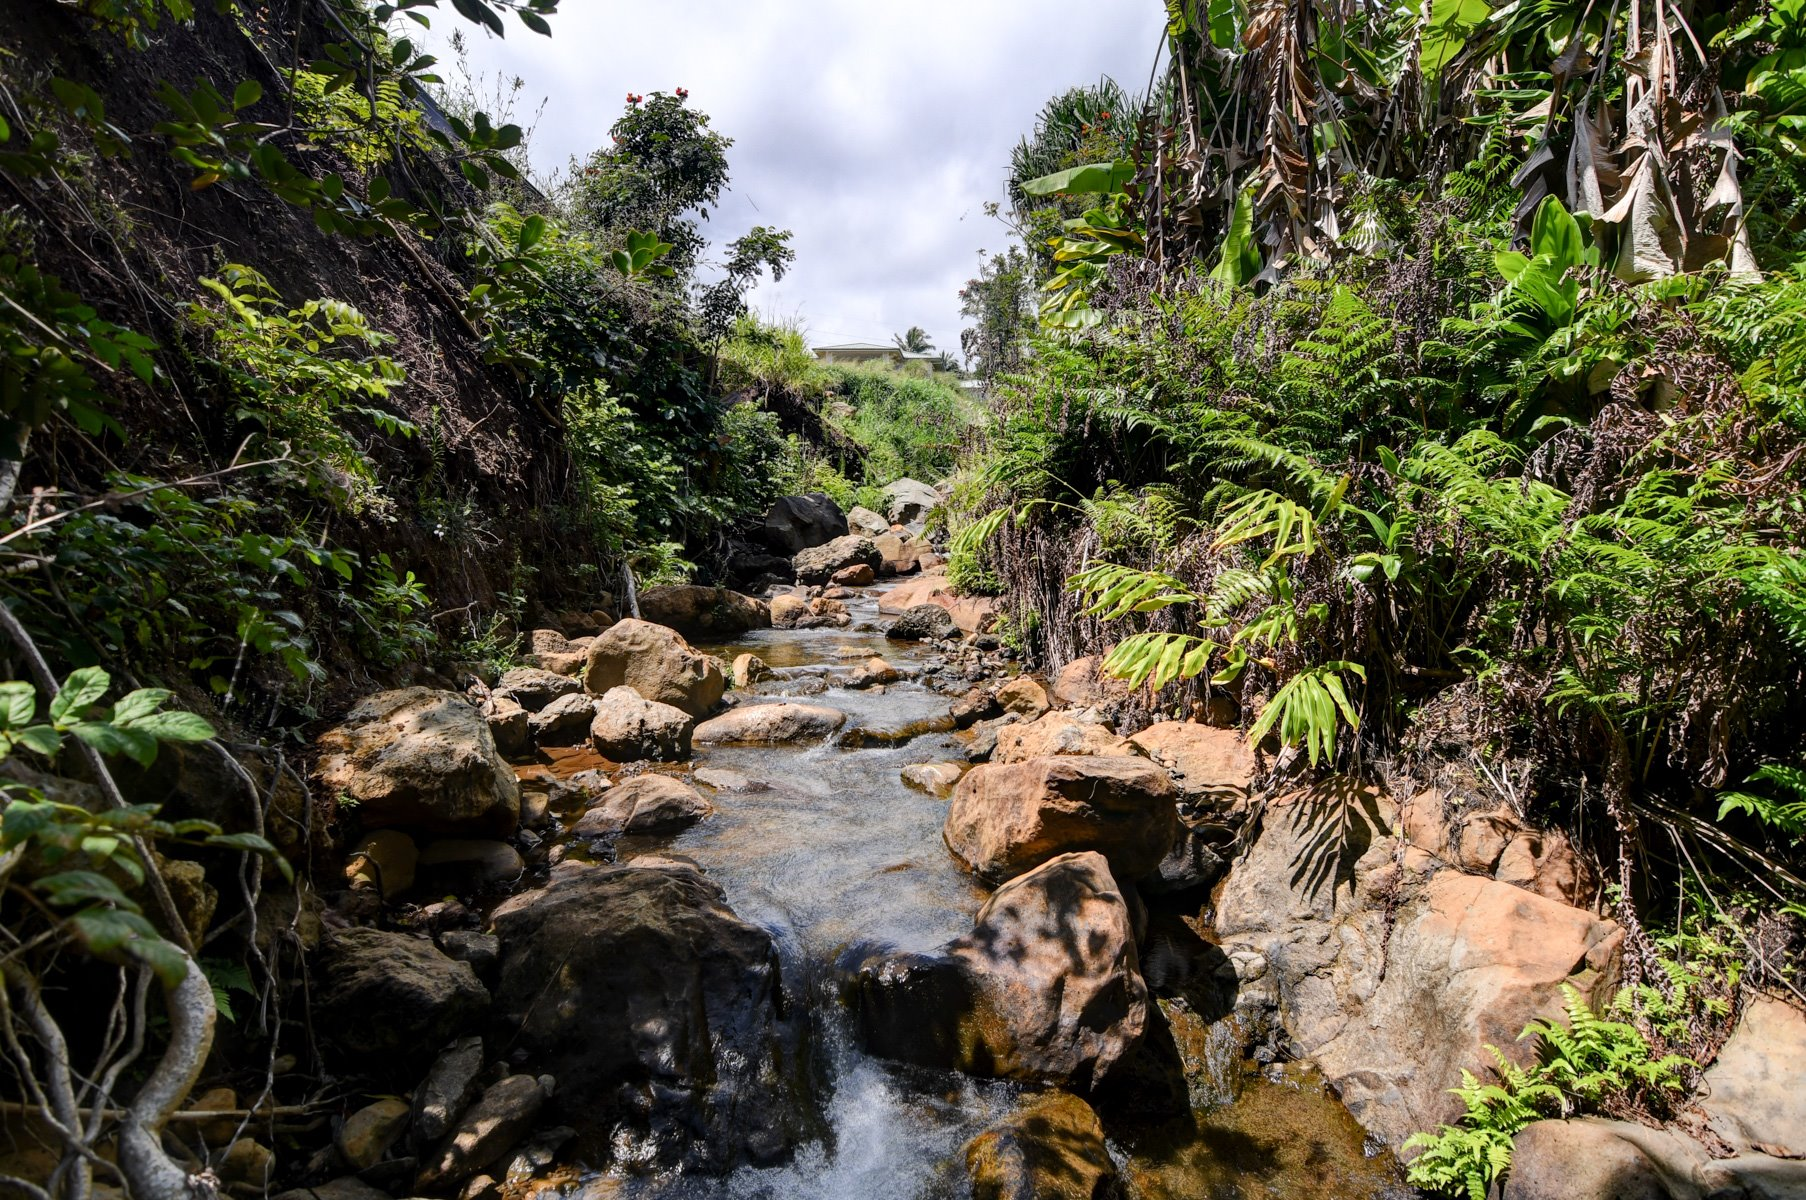 The bordering stream